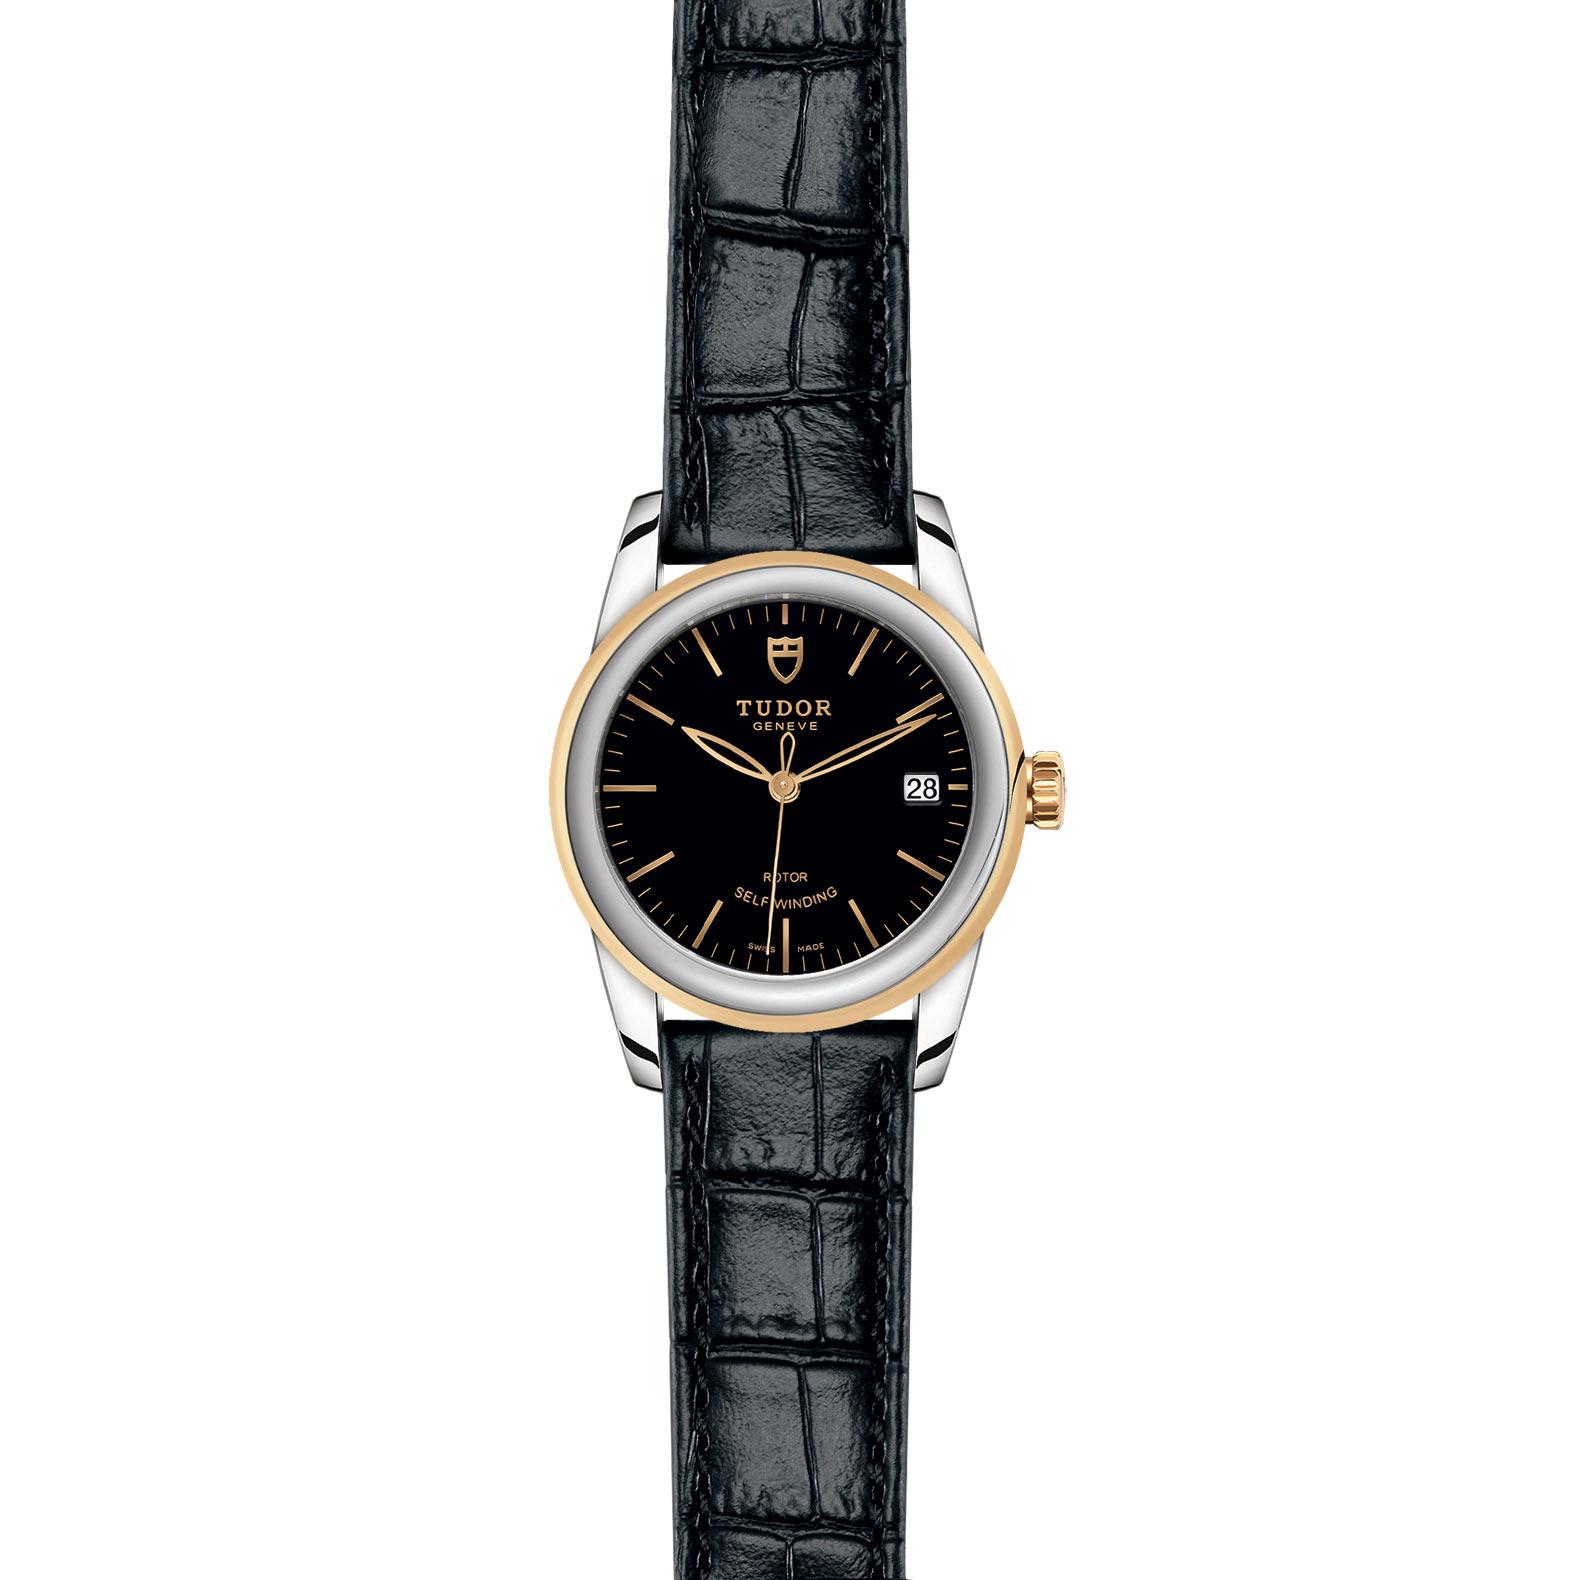 TUDOR Glamour Date M55003 0029 Frontfacing